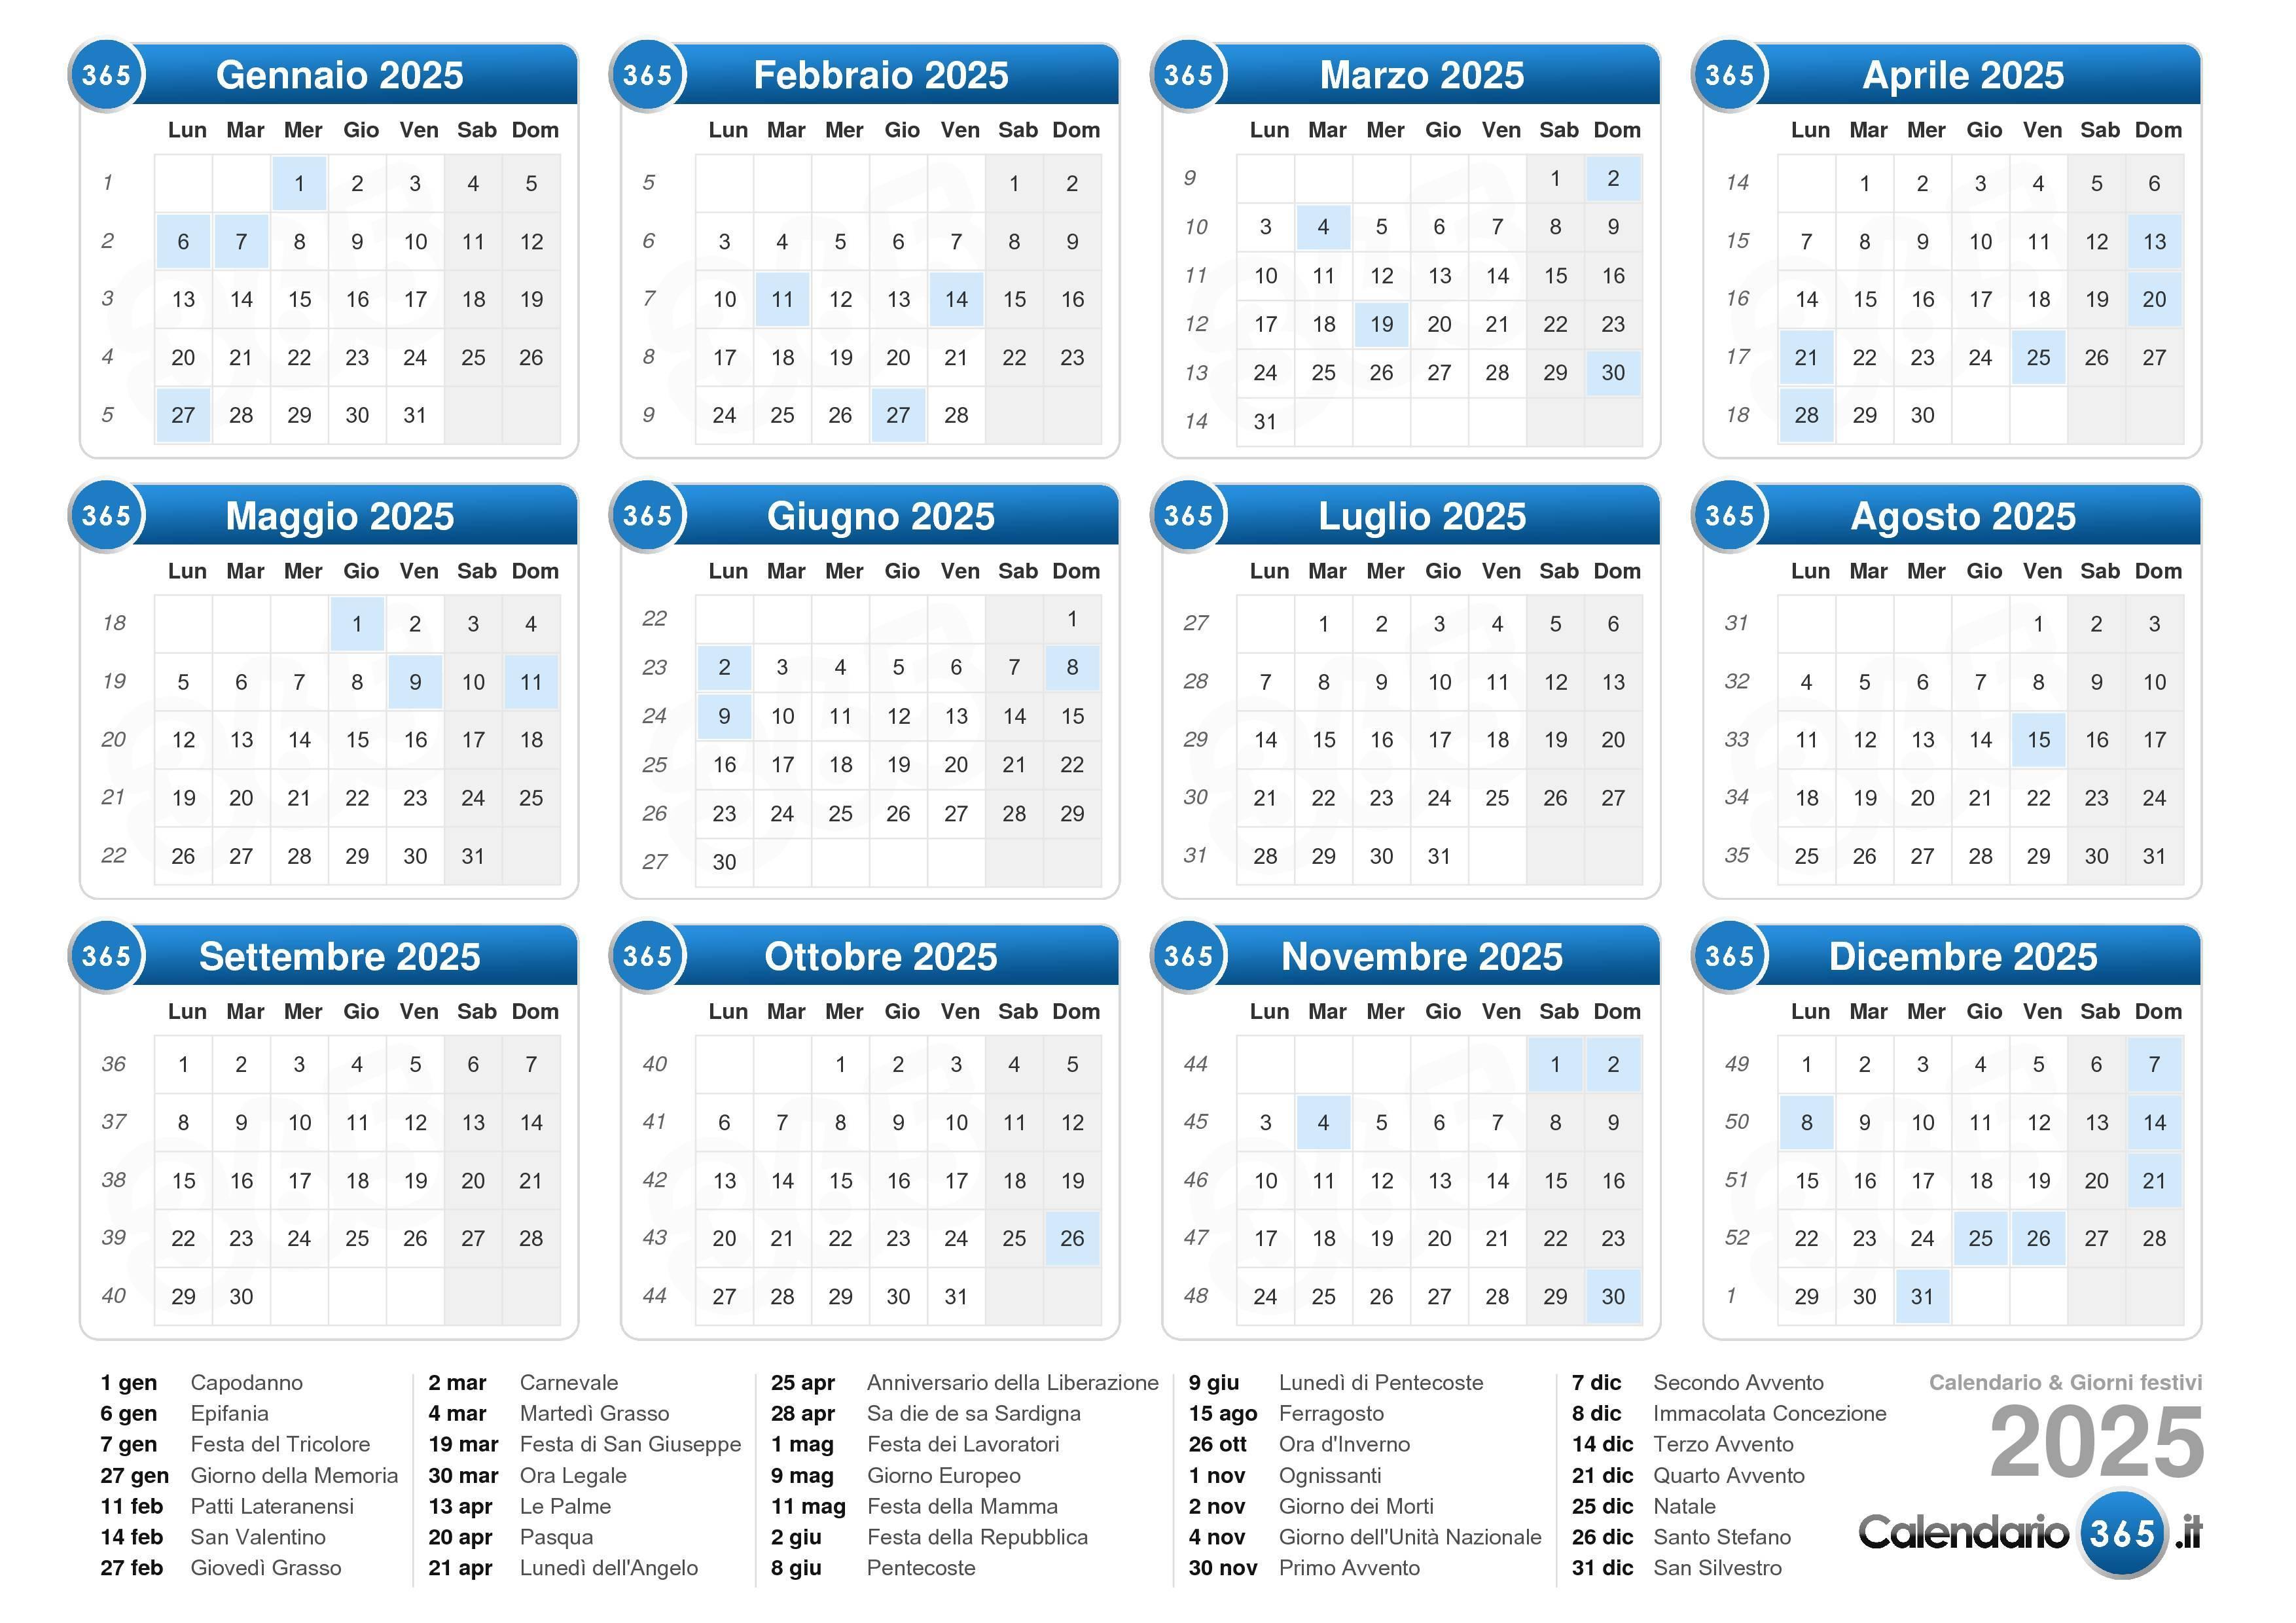 Calendario Delle Settimane Di Gravidanza.Calendario 2025